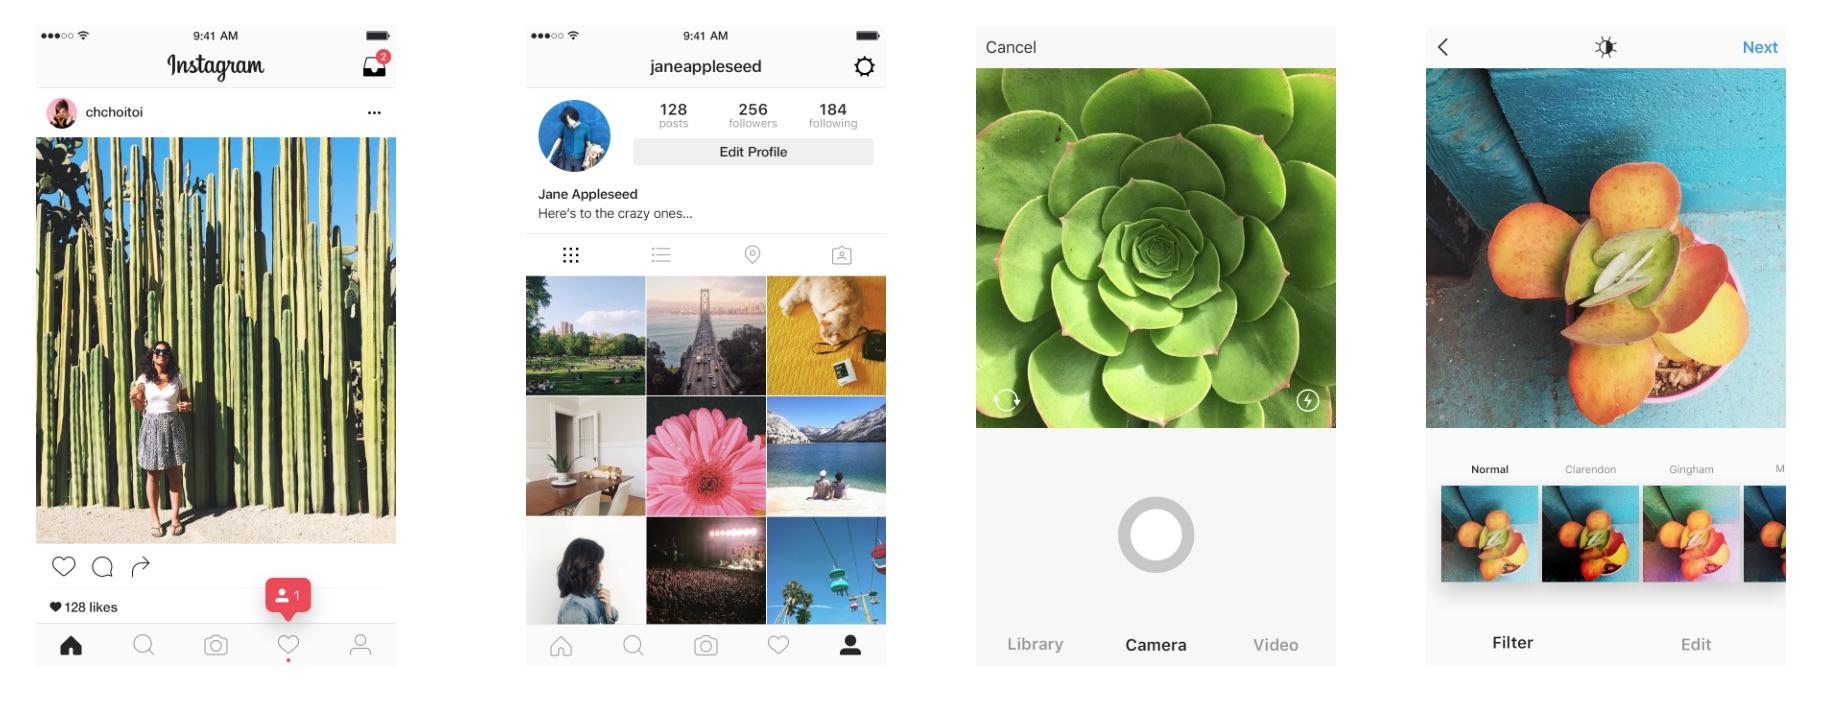 mediarun-instagram-ecommerce2